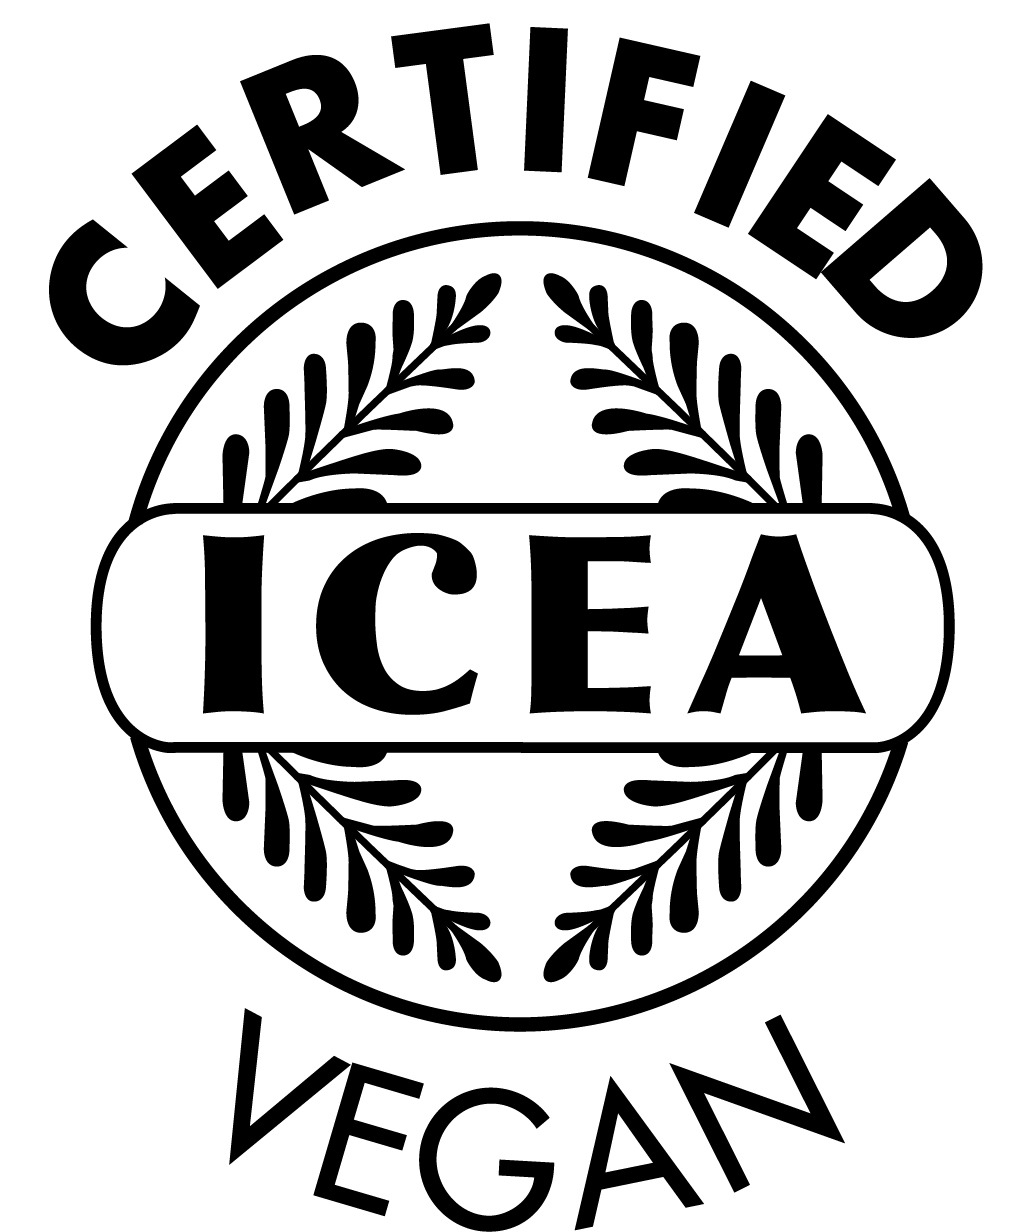 icea vegan